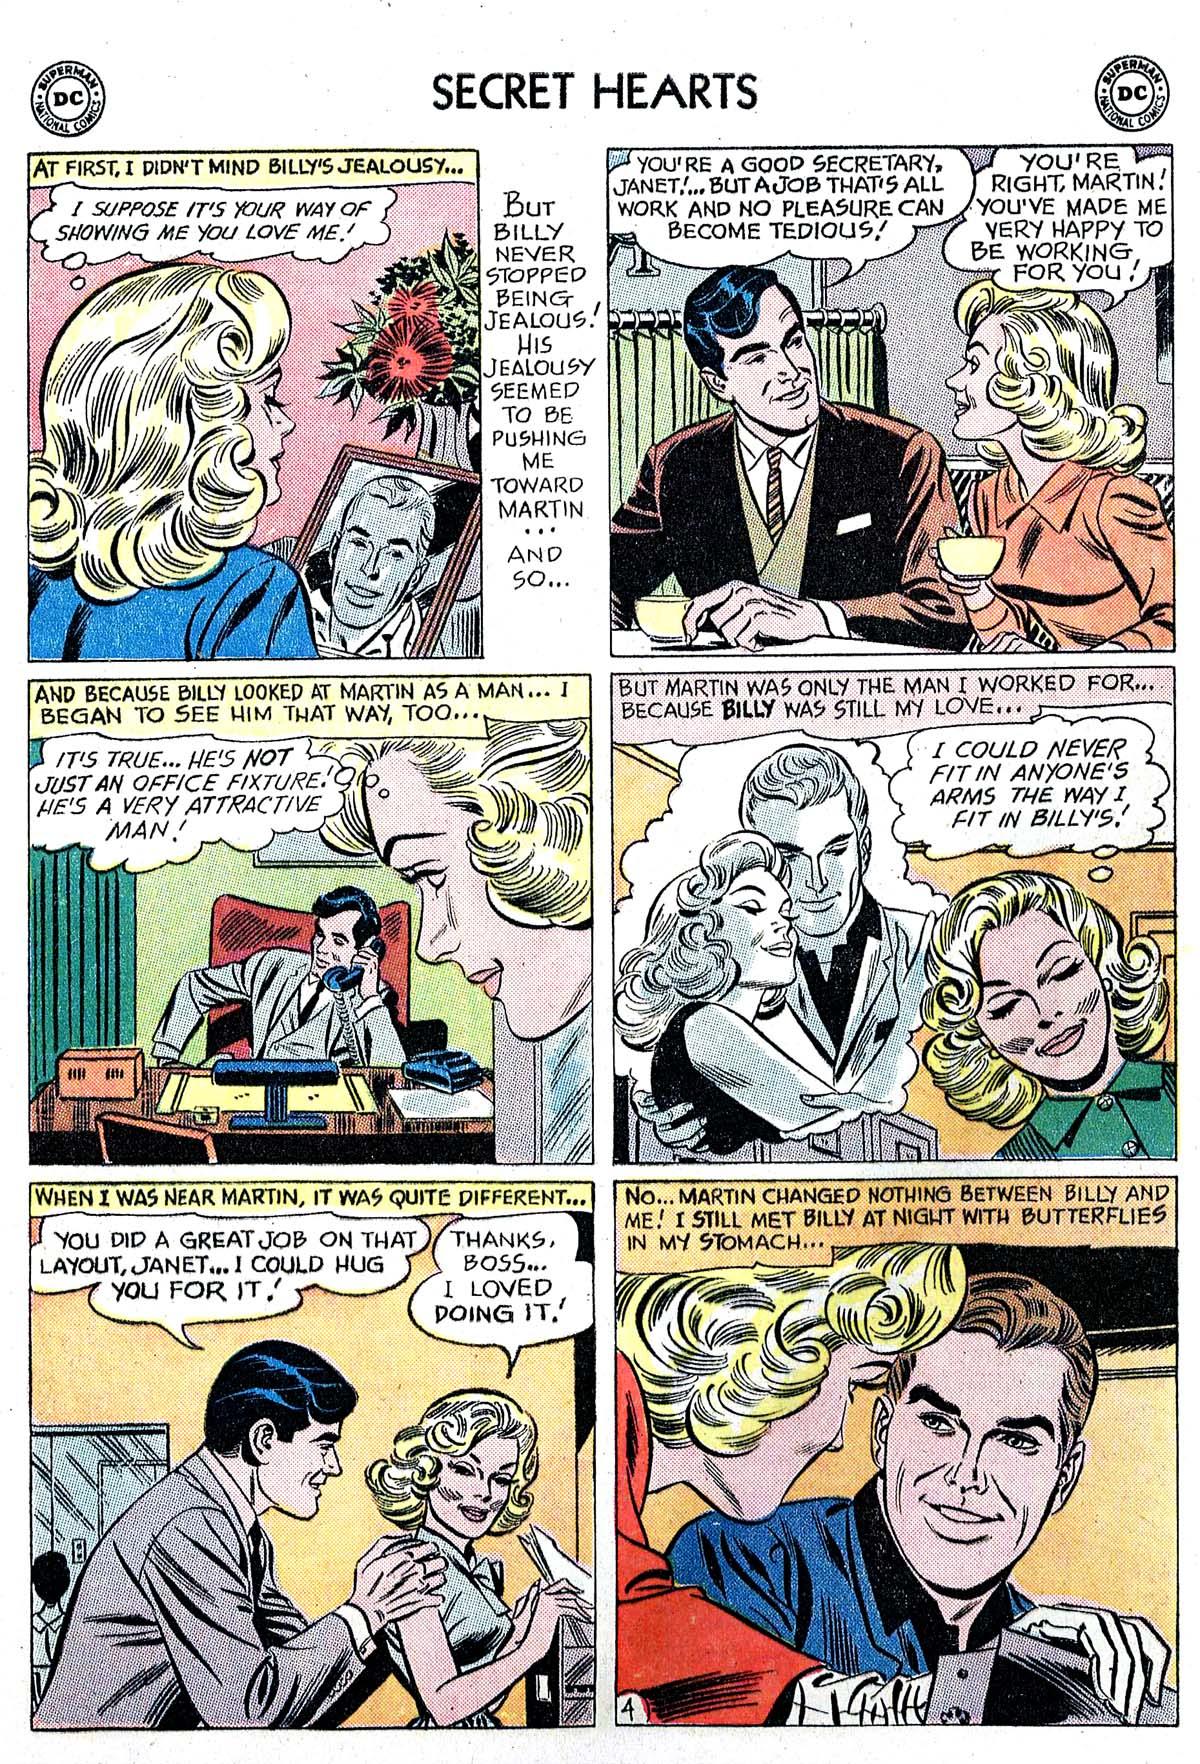 Read online Secret Hearts comic -  Issue #82 - 13